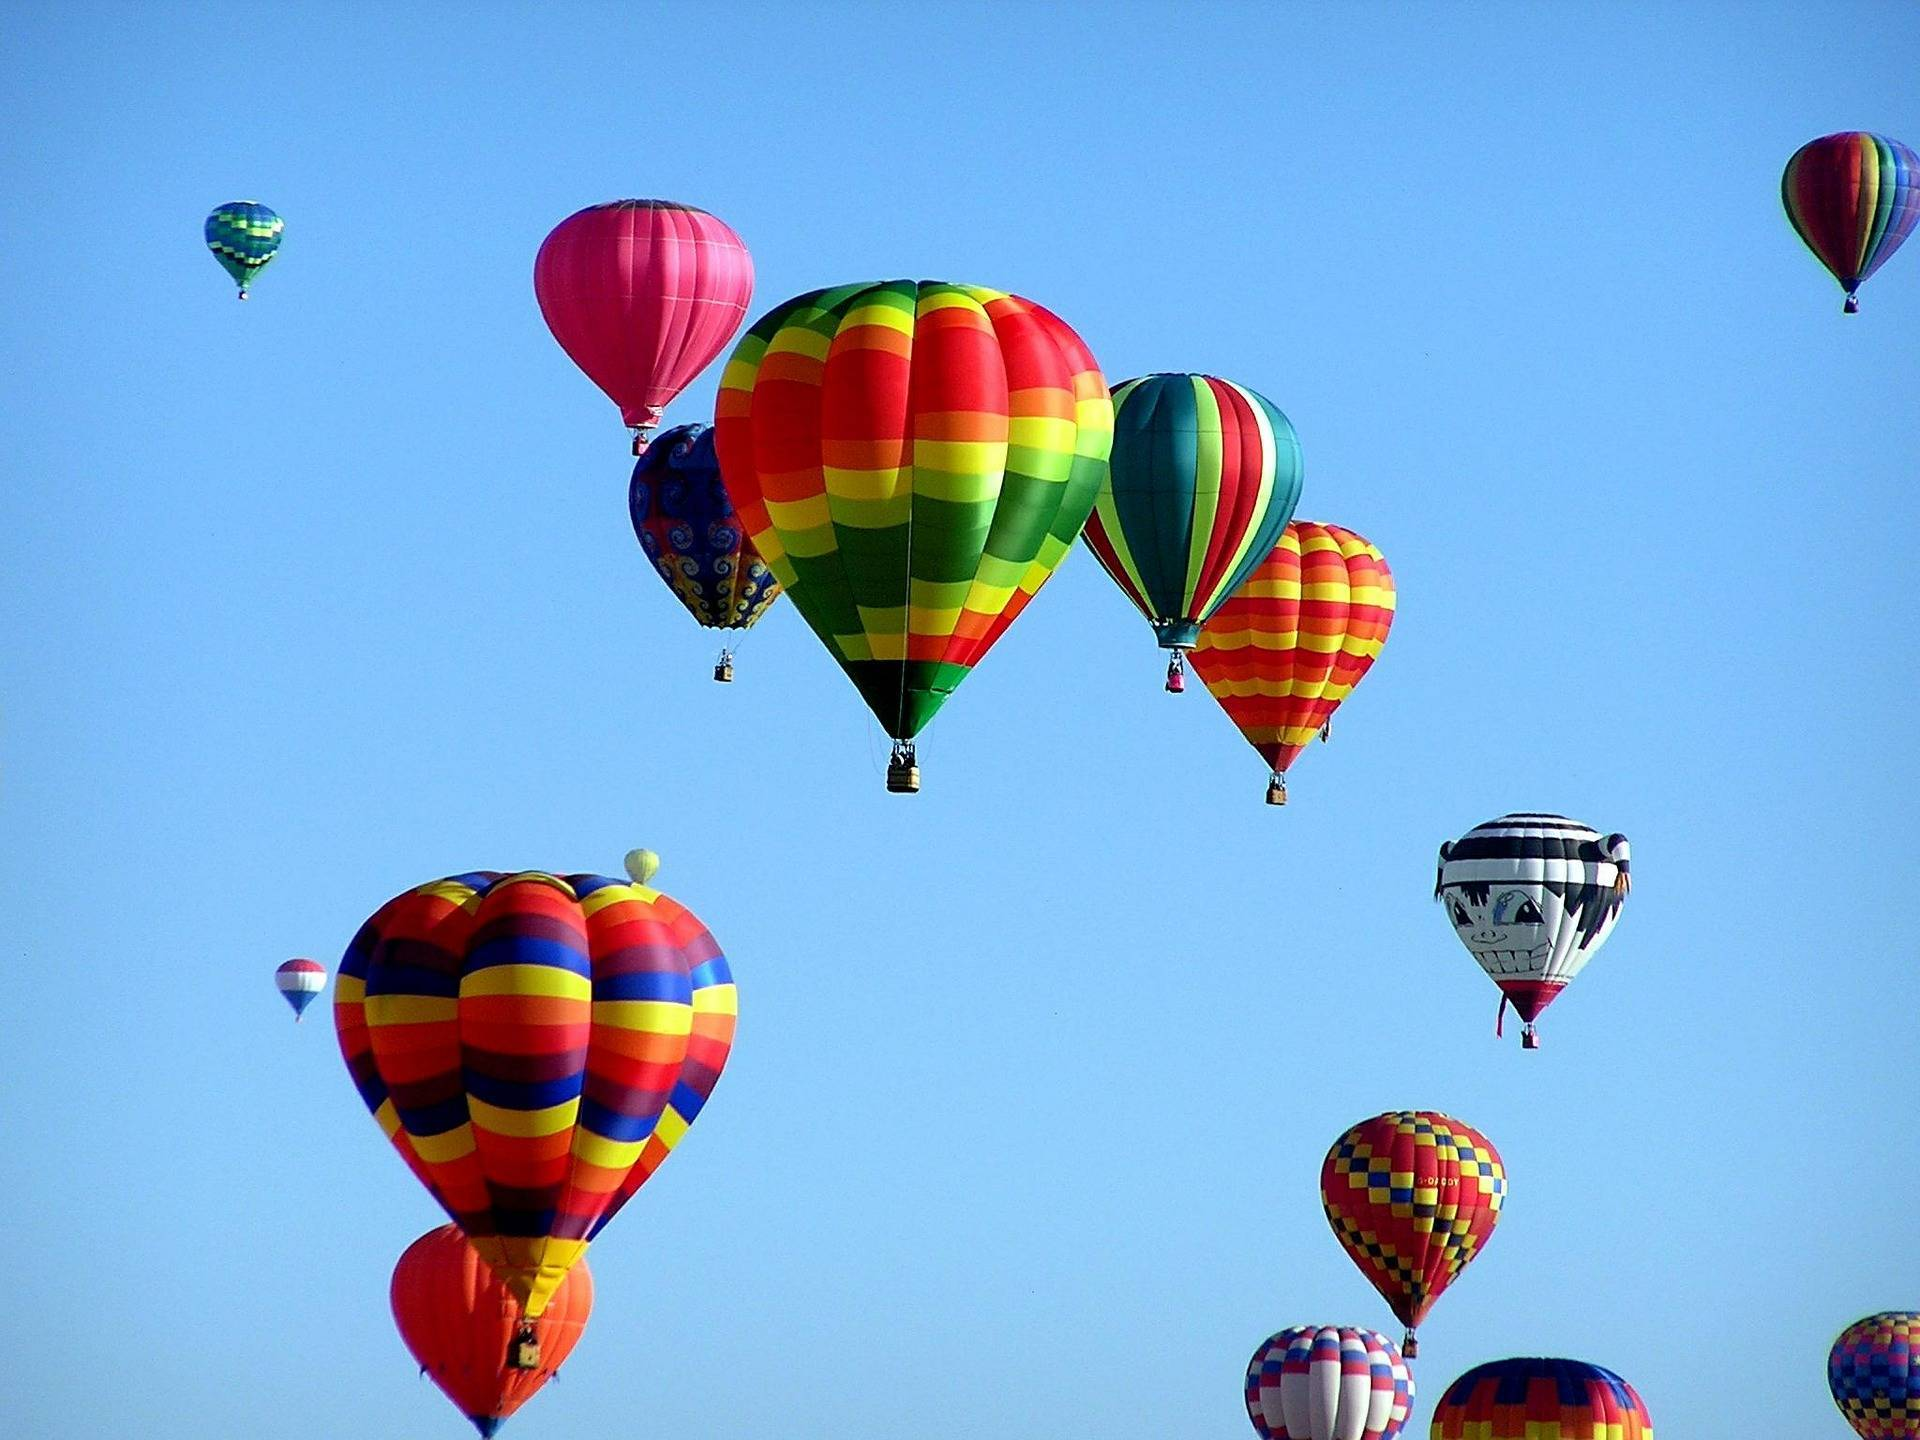 f9c6aa9cbc52372d7ab3_hot-air-balloons-439331_1920.jpg